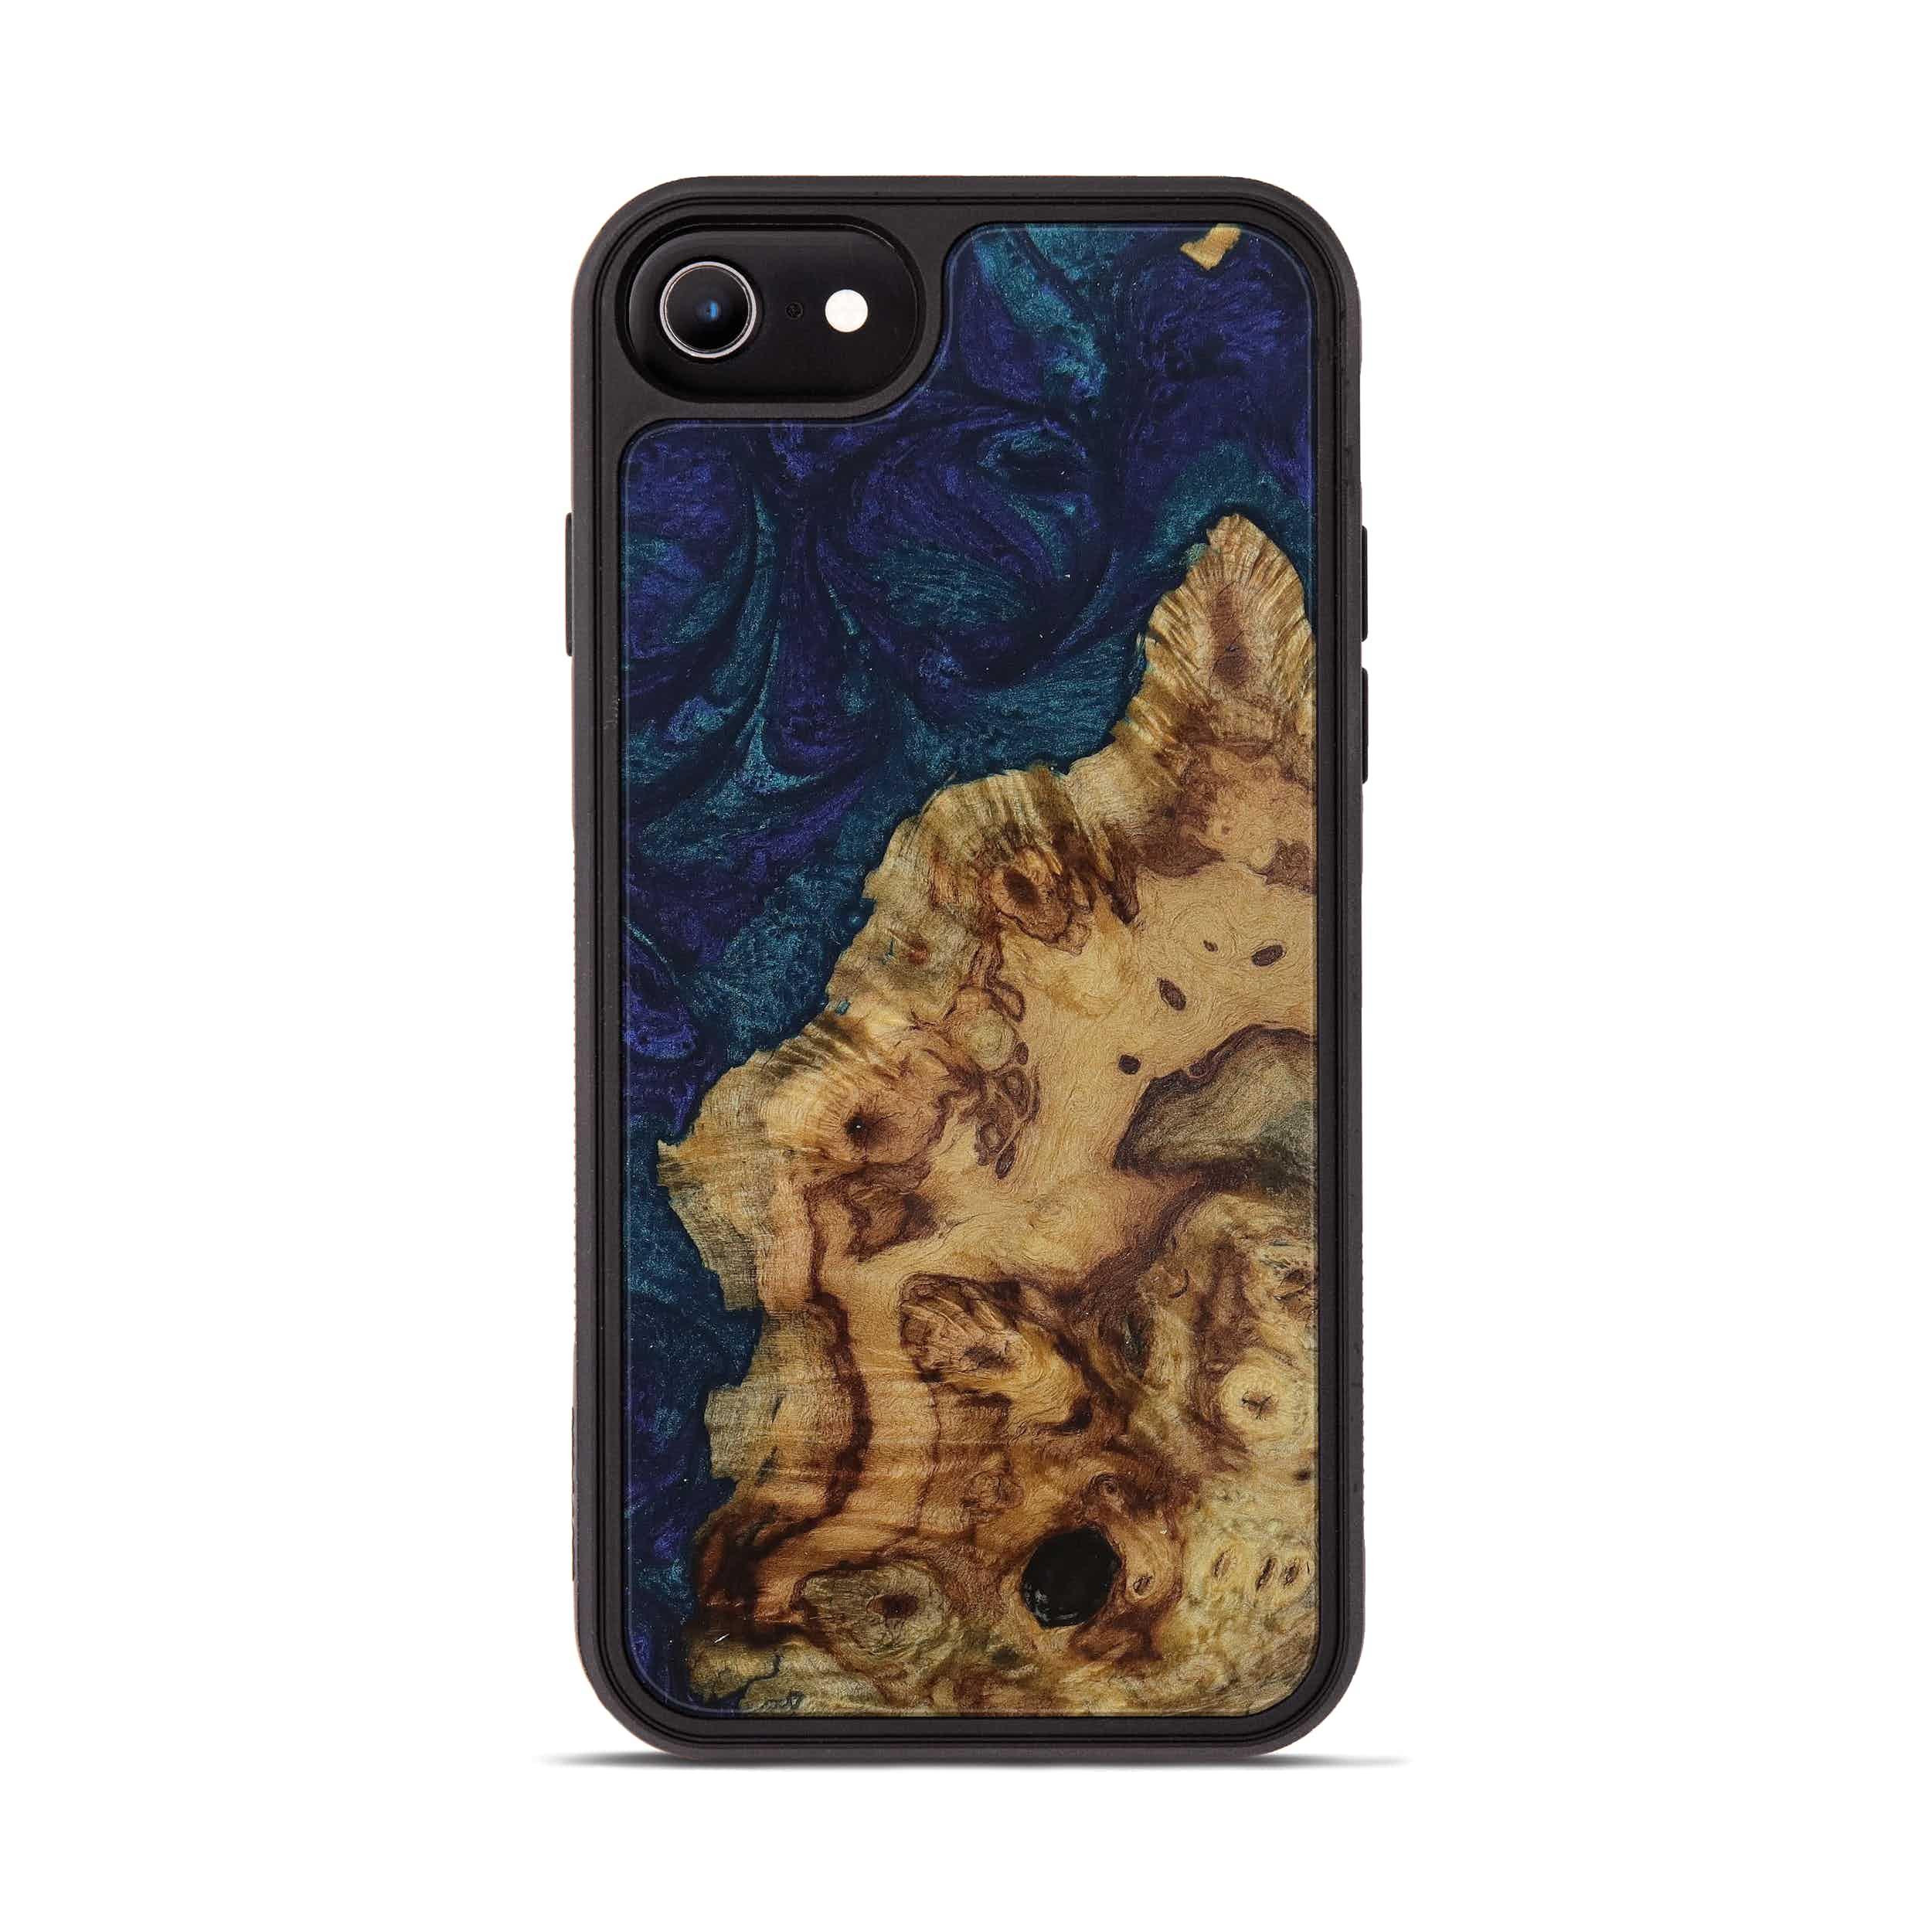 iPhone 8 Wood+Resin Phone Case - Carry (Dark Blue, 394713)